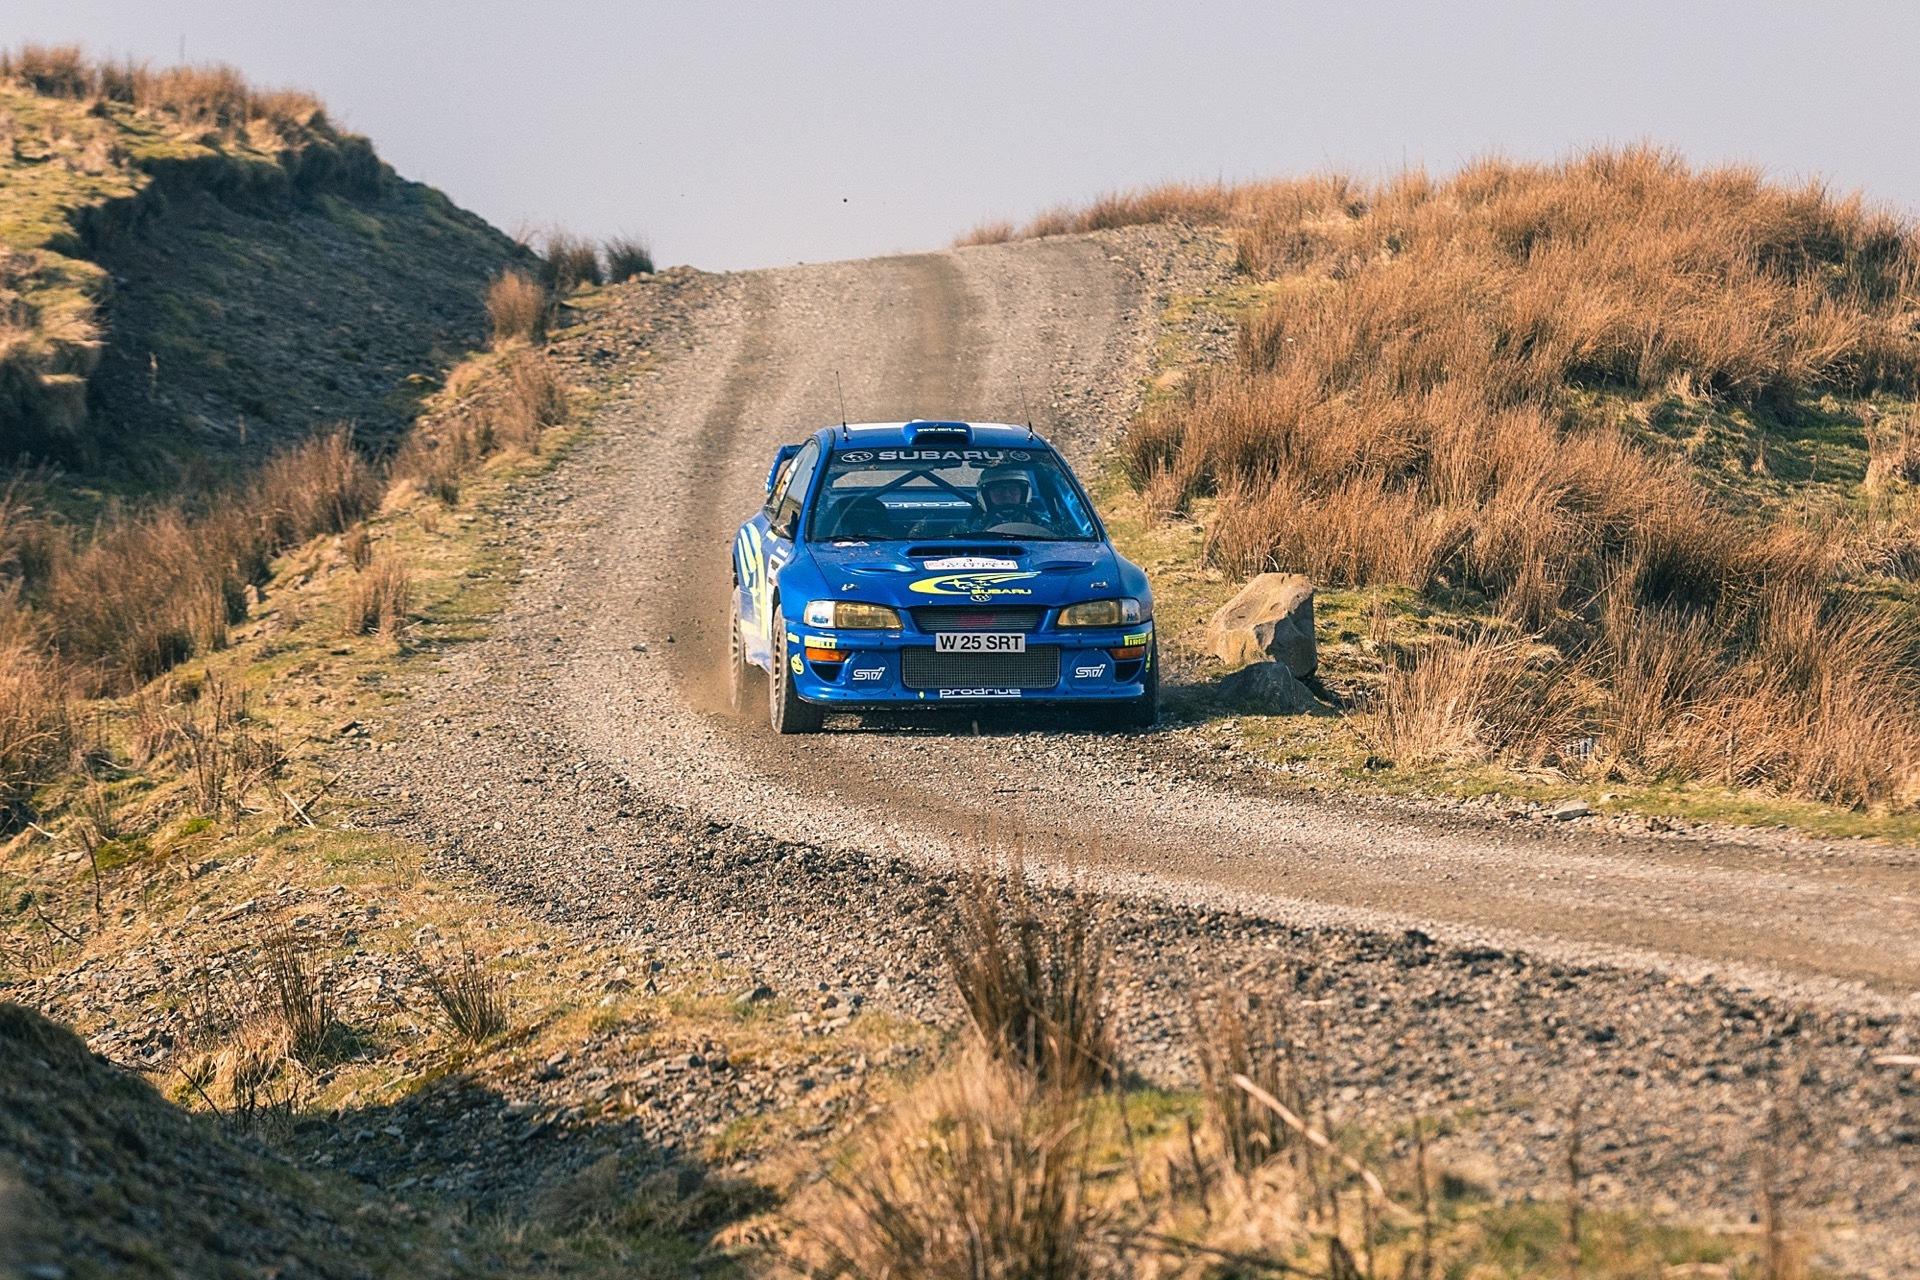 Richard_Burns_Subaru_Impreza_WRC_sale-0011